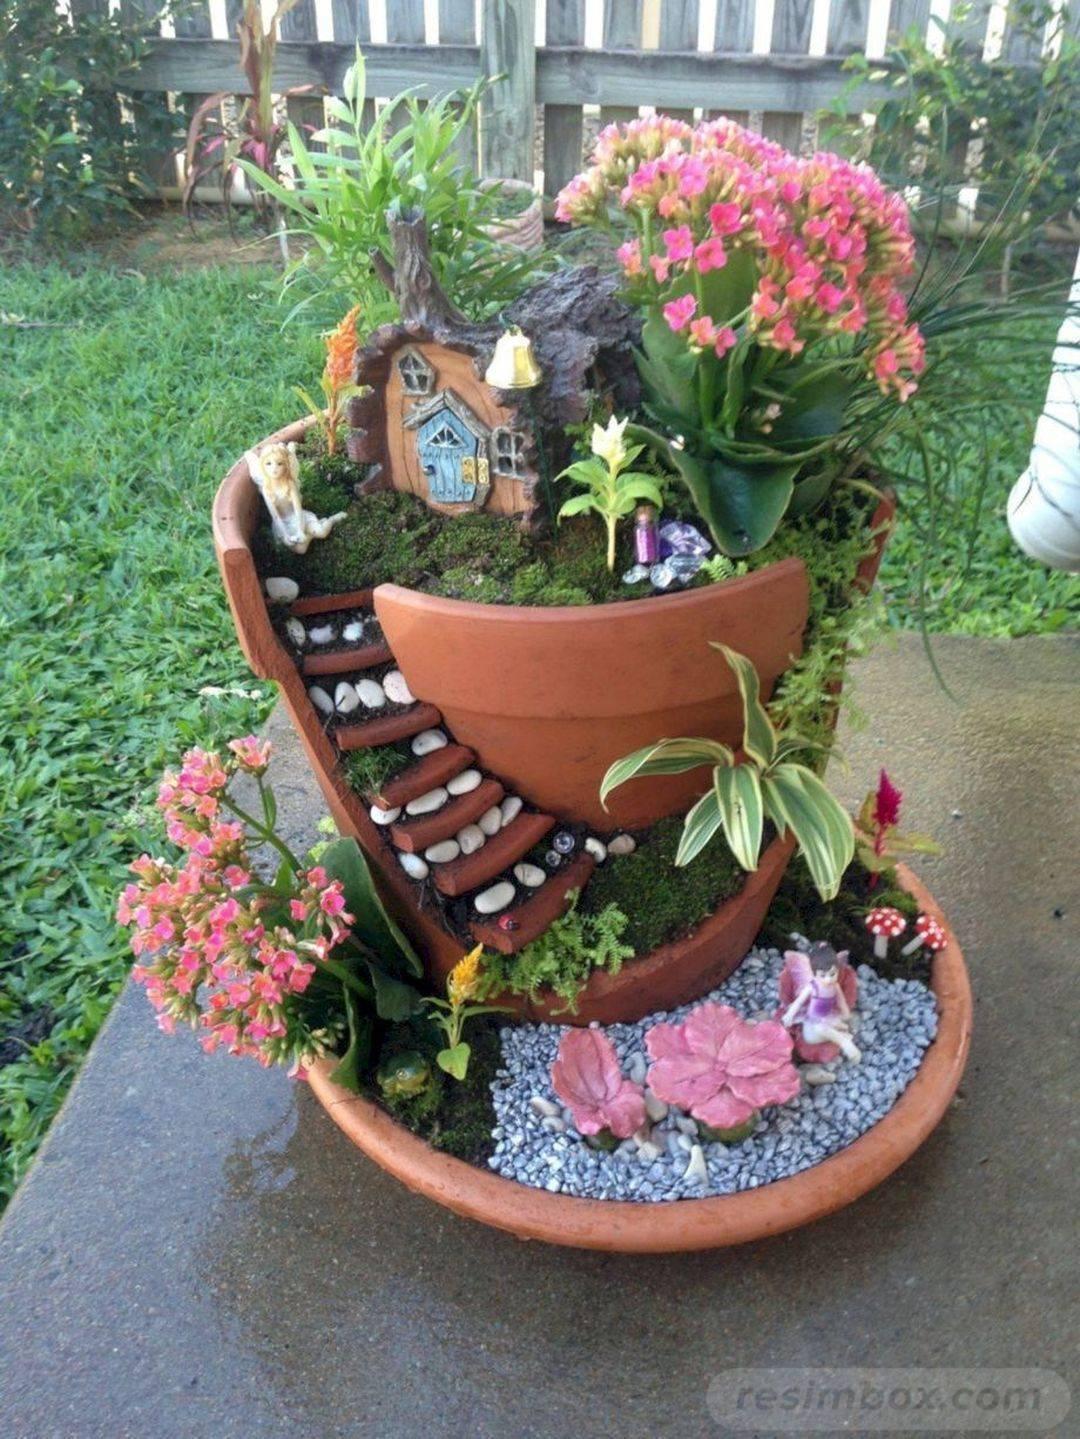 garden pot design-AQeM6tgIZerlYvRtYGed87mv2EvI3gLrl_Rn6Hx2HaGhSVY0_iqZaVw